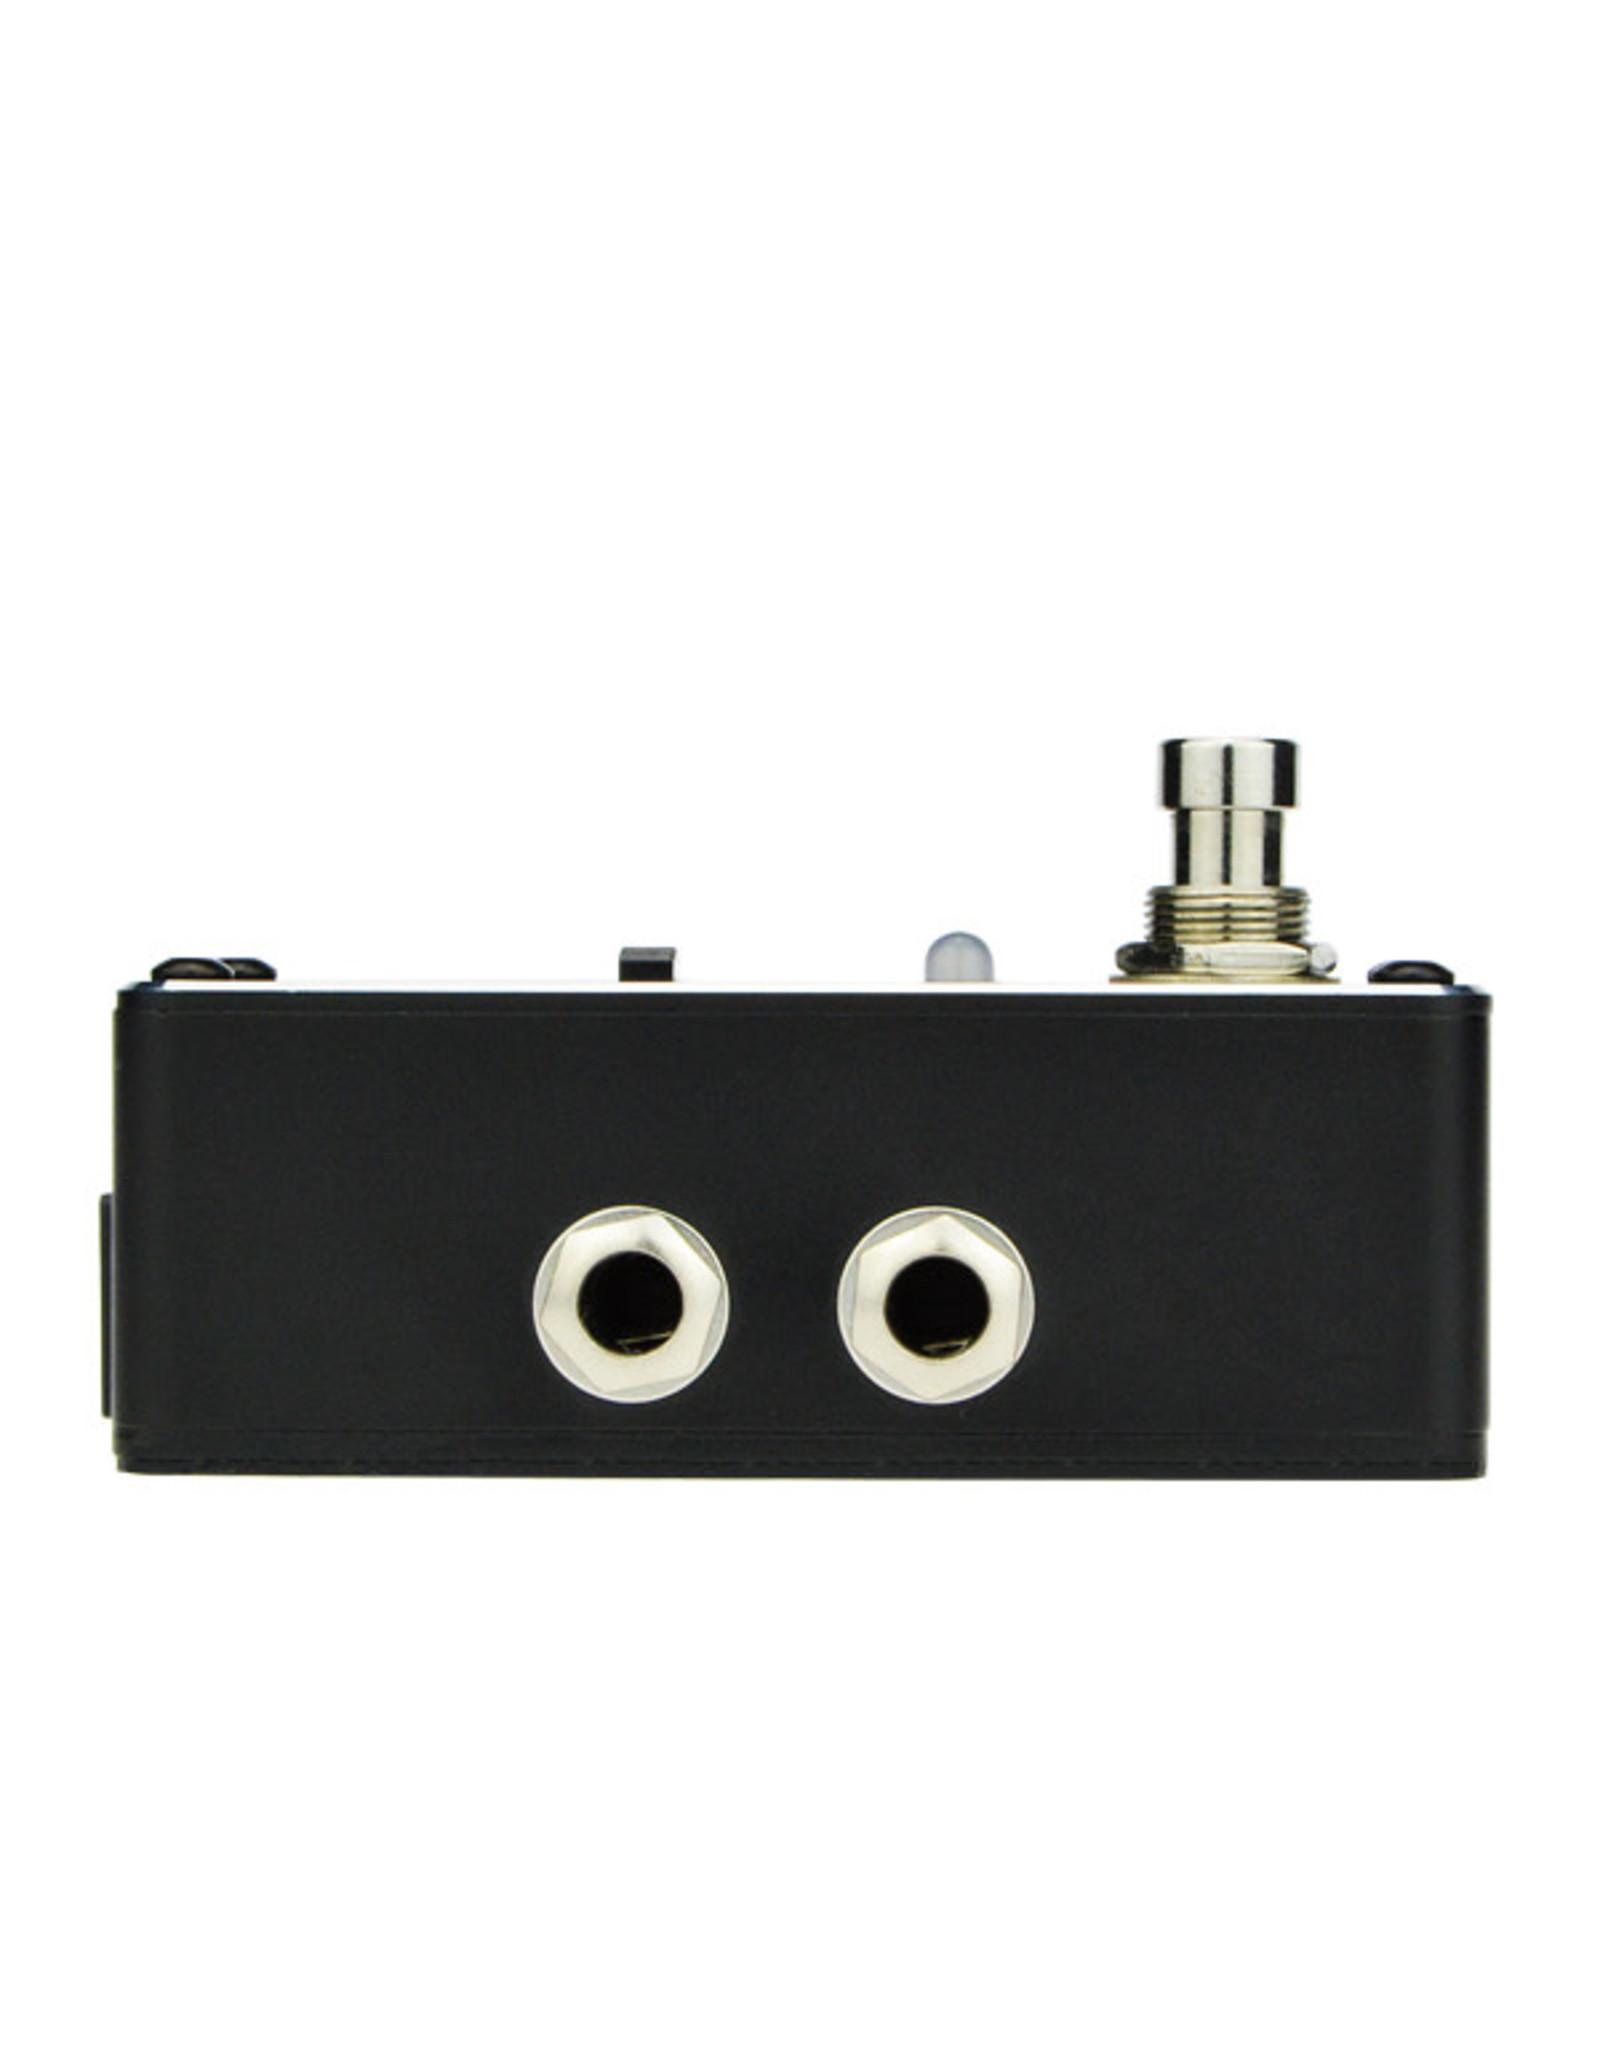 Tom'sline Tomsline  A/B Box Liner Mini Pedal